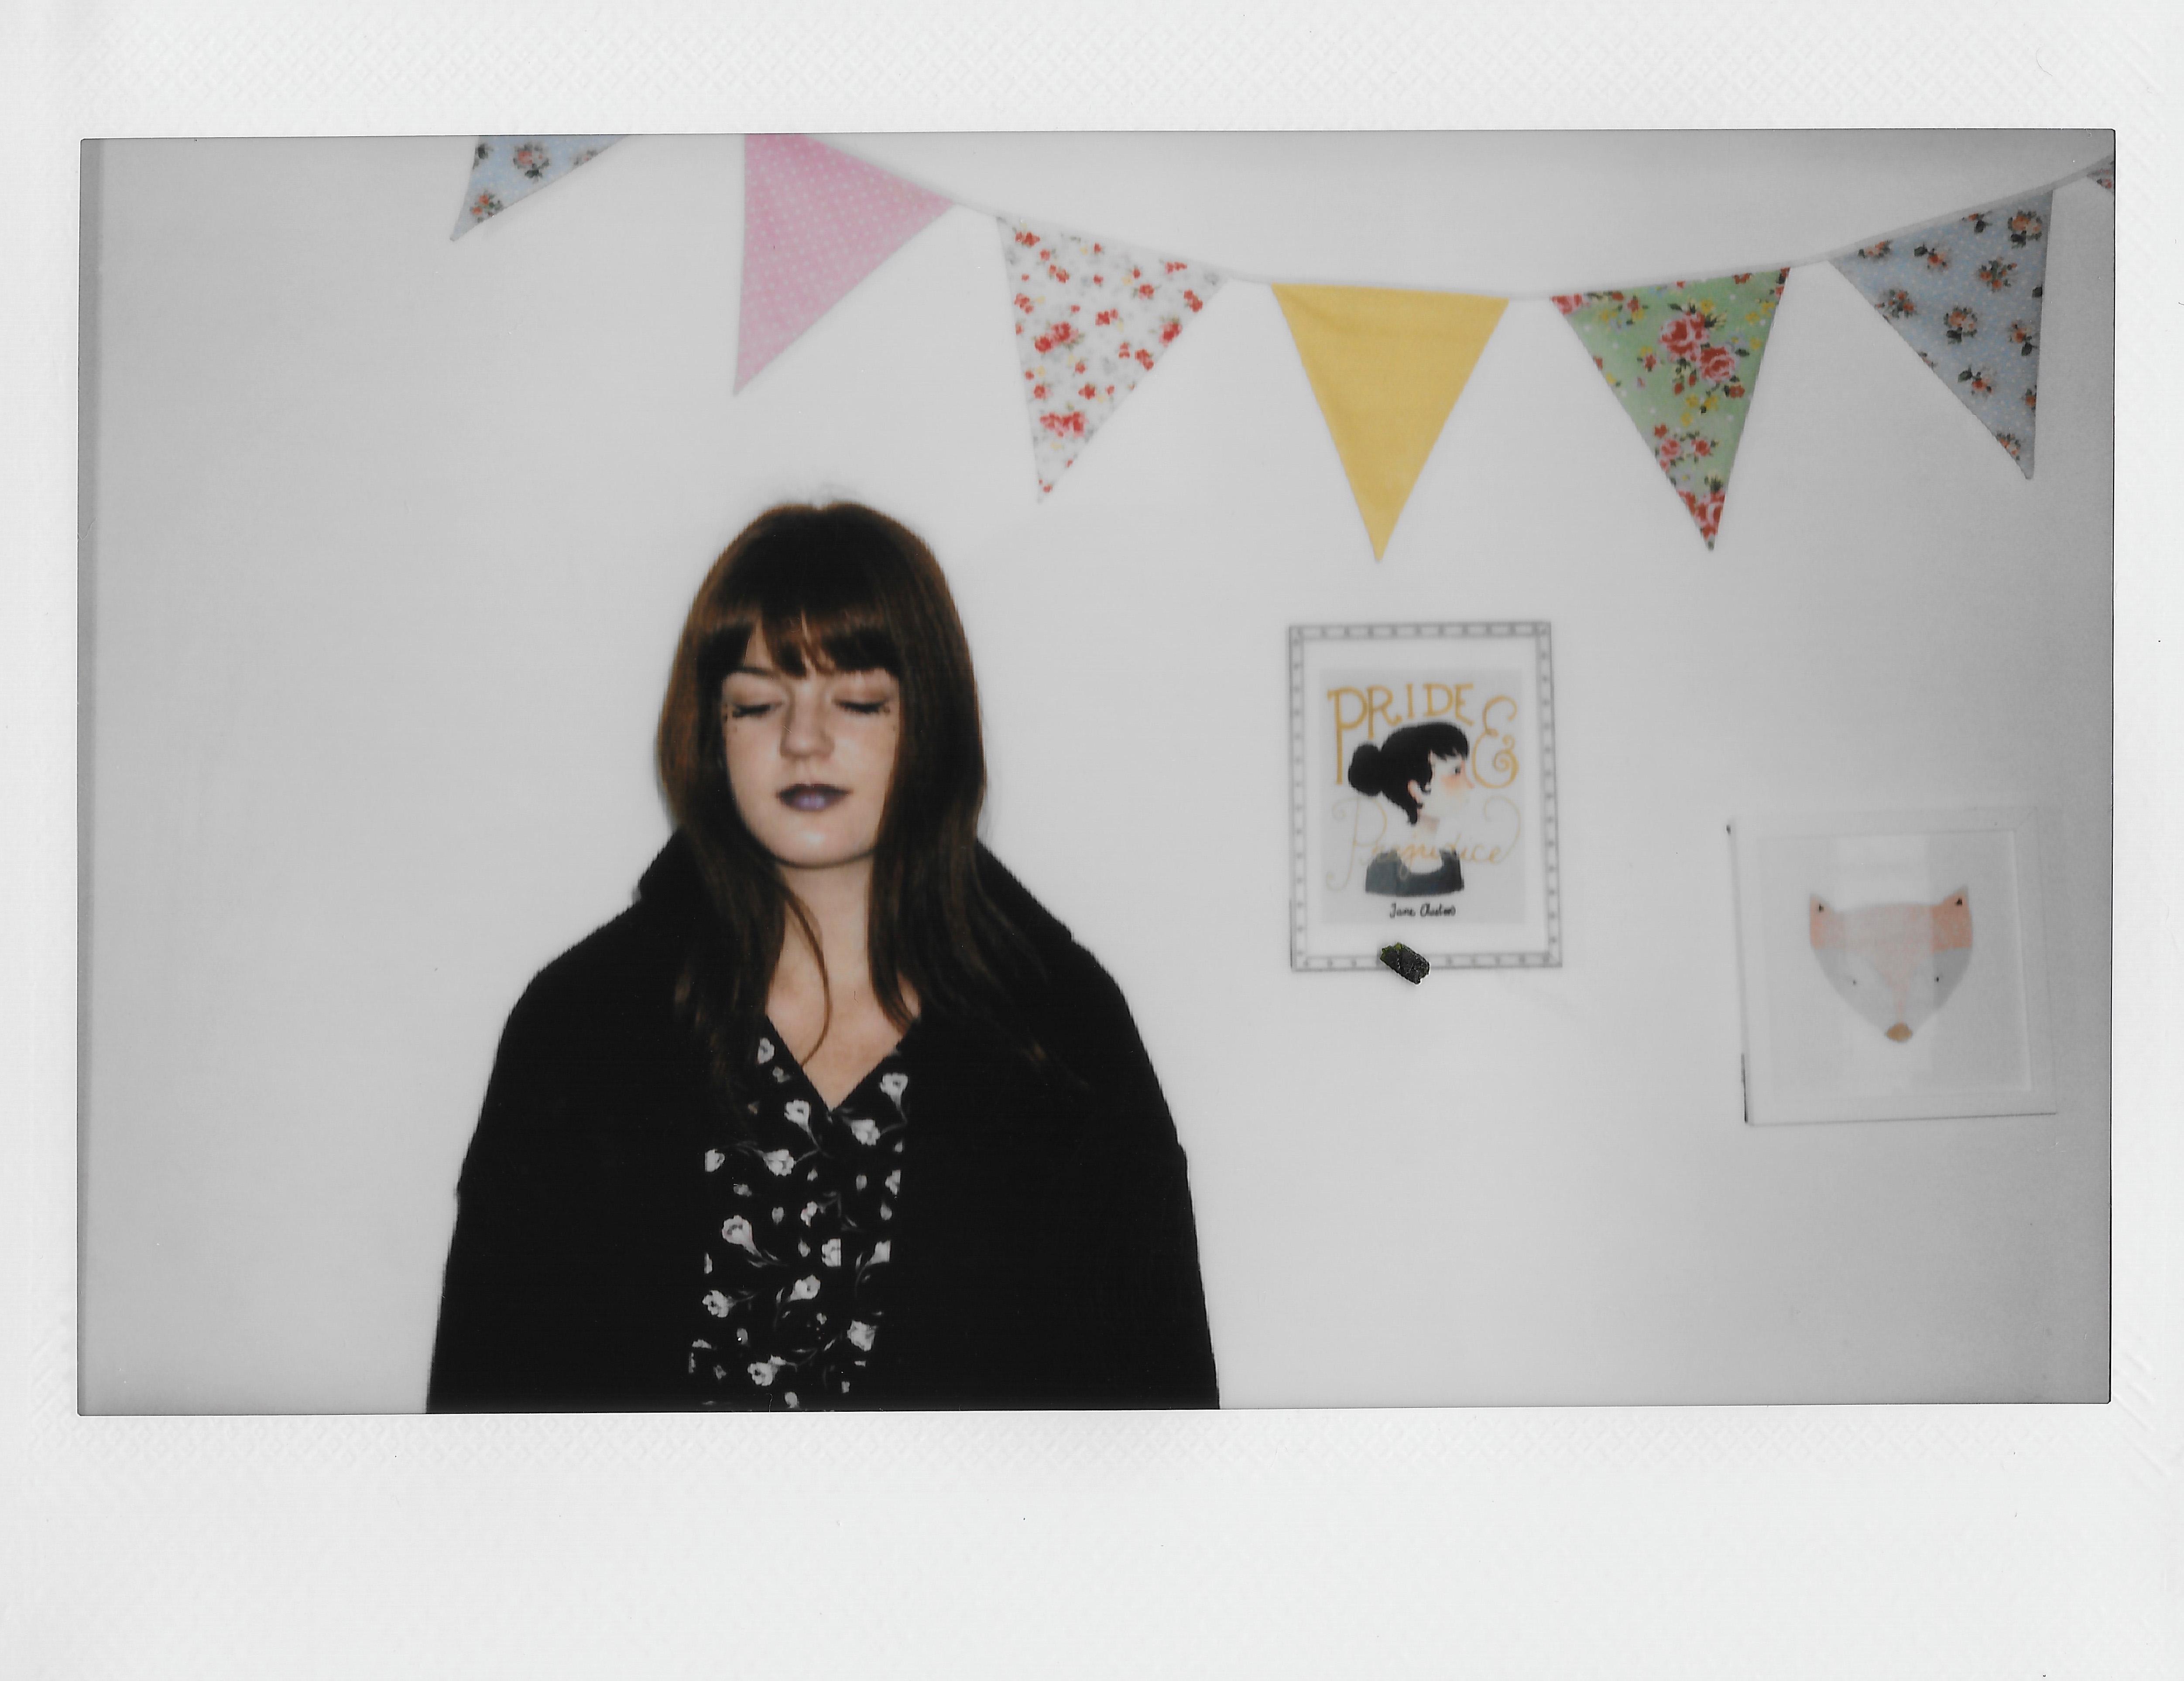 Polaroids of Sasha